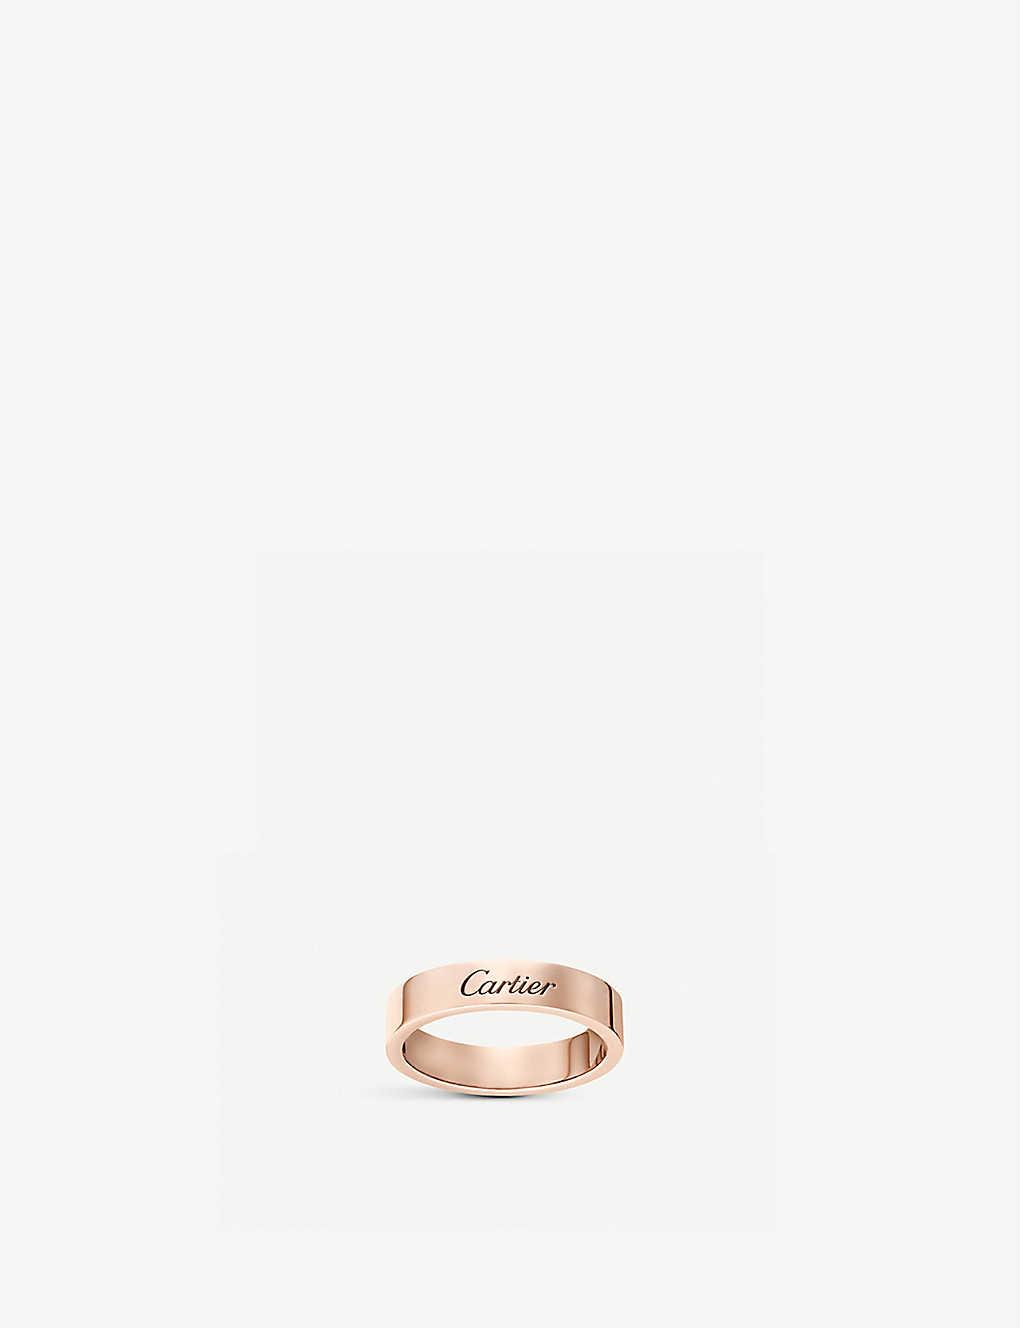 Cartier C De Cartier Rose Gold Wedding Ring Selfridges Com